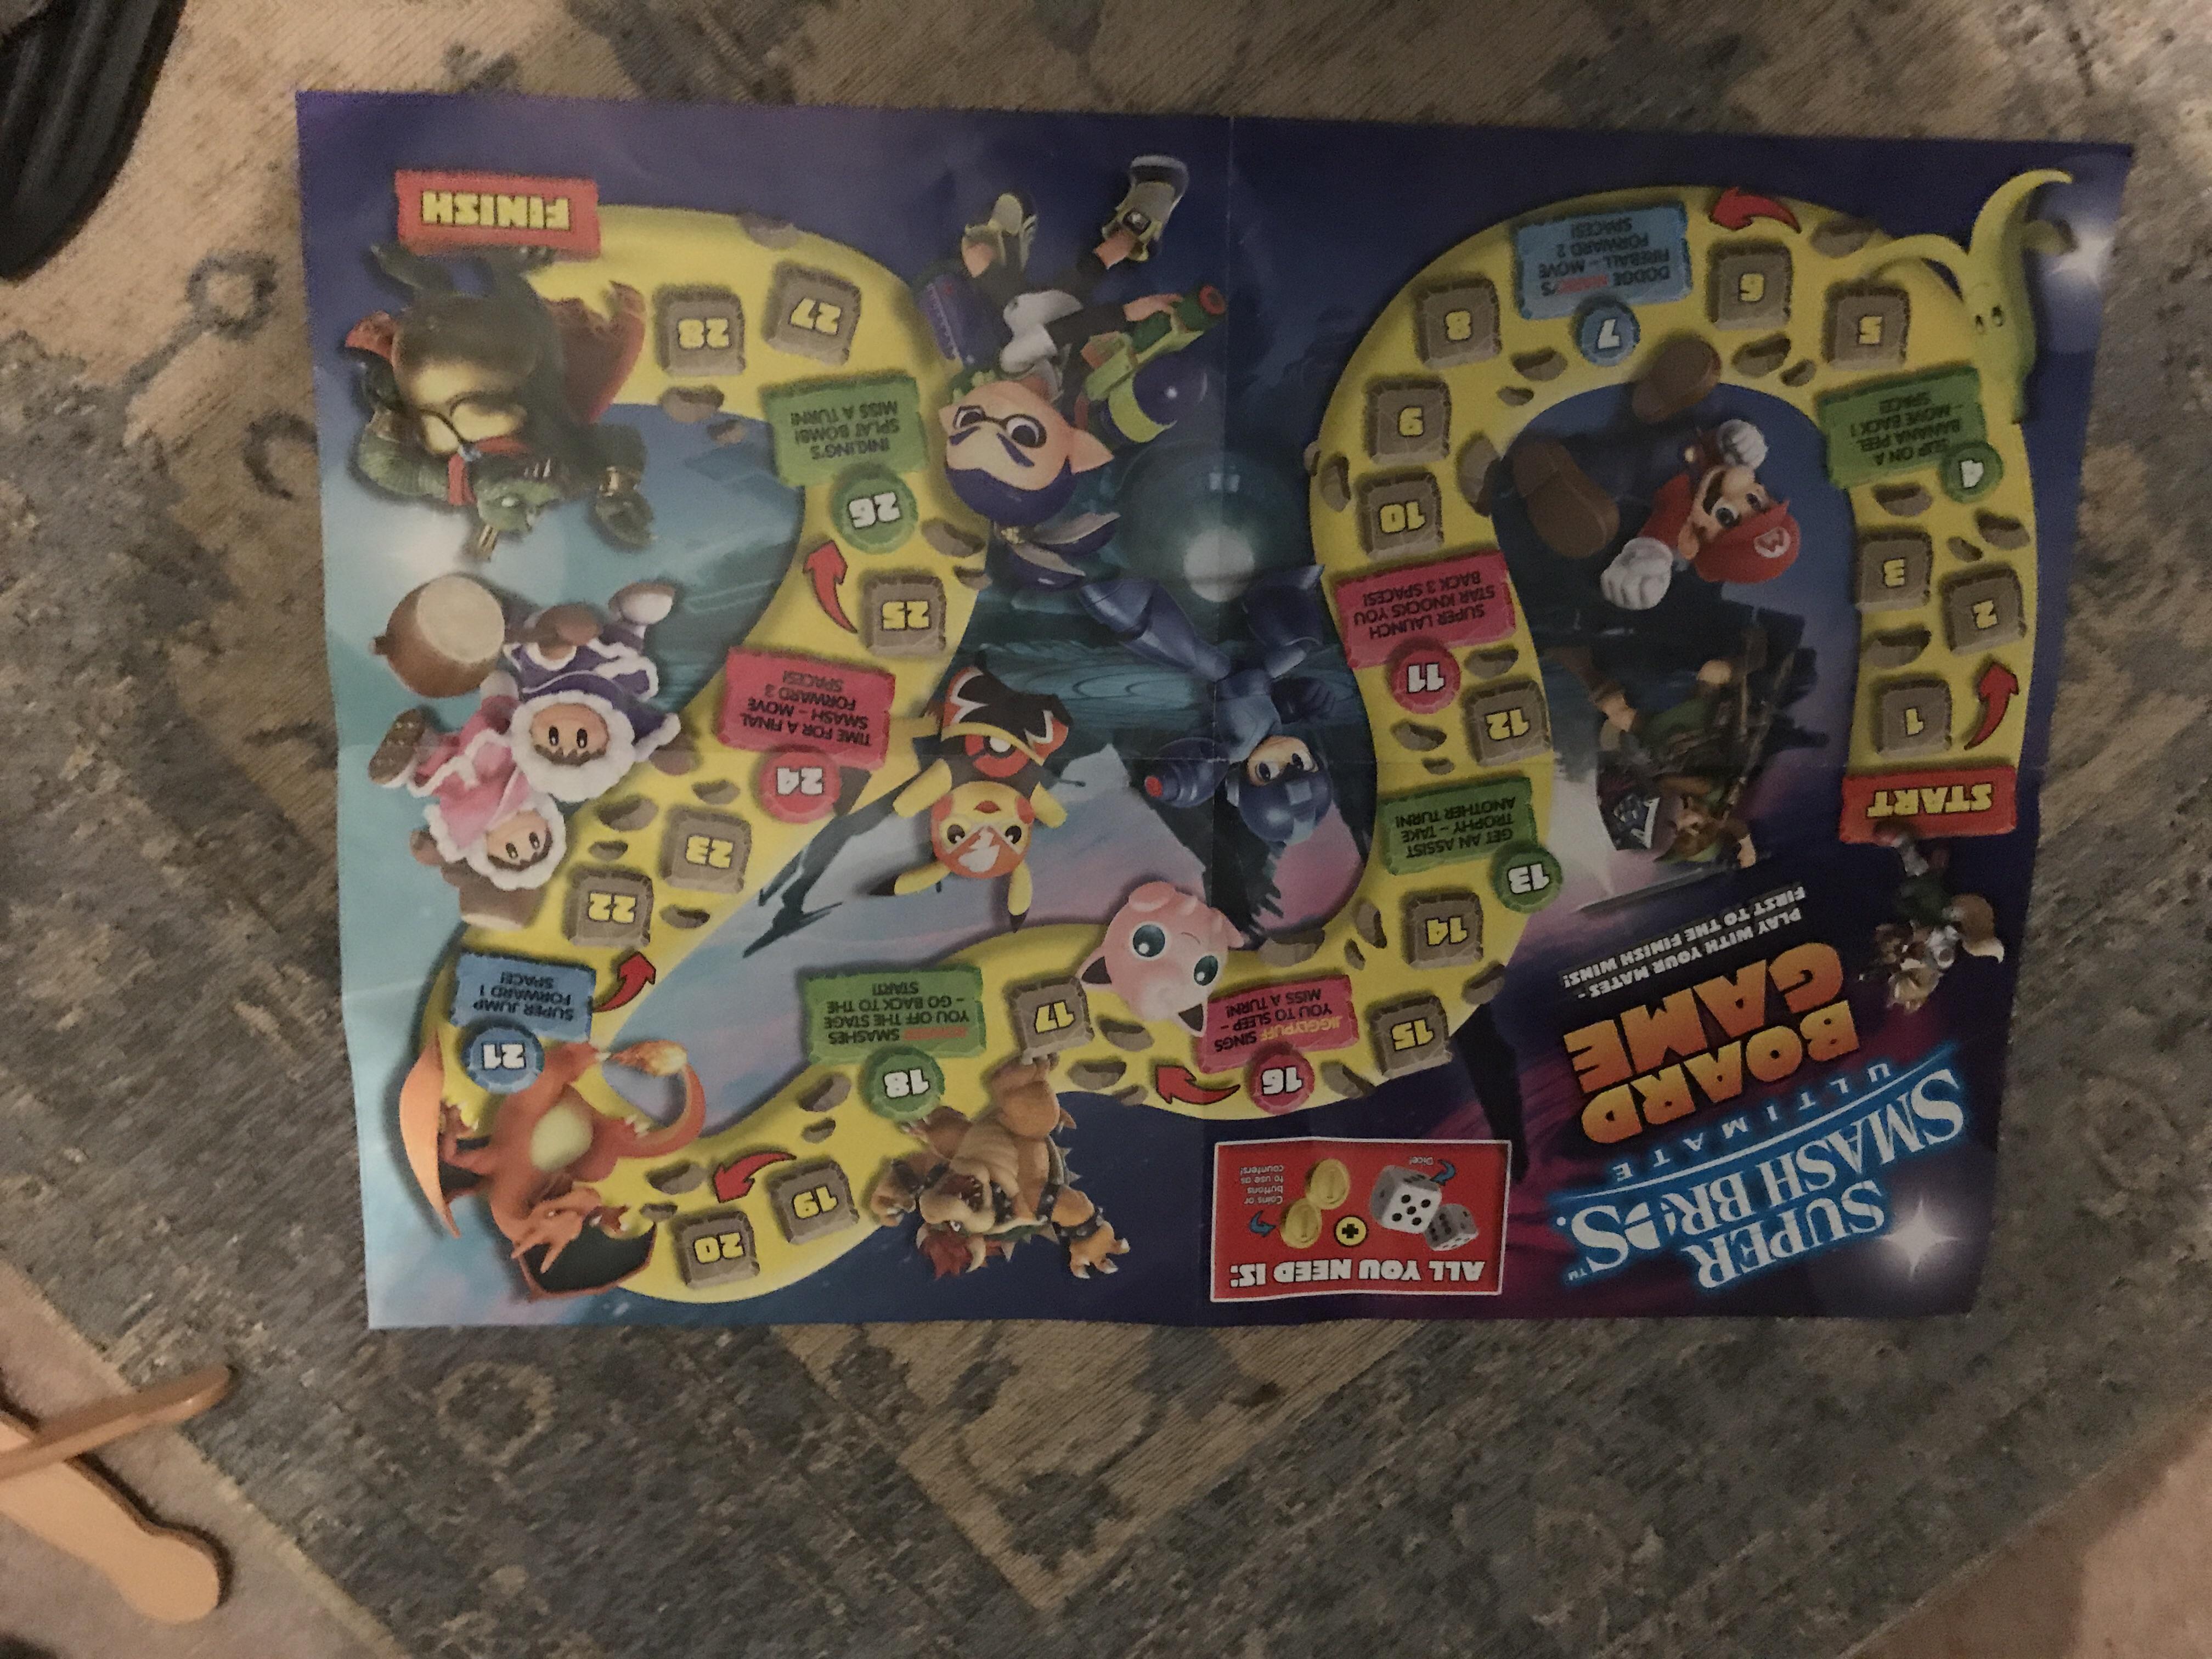 Super Smash Bros Ultimate Board Game (Found 2018 Bootleg Board Game)